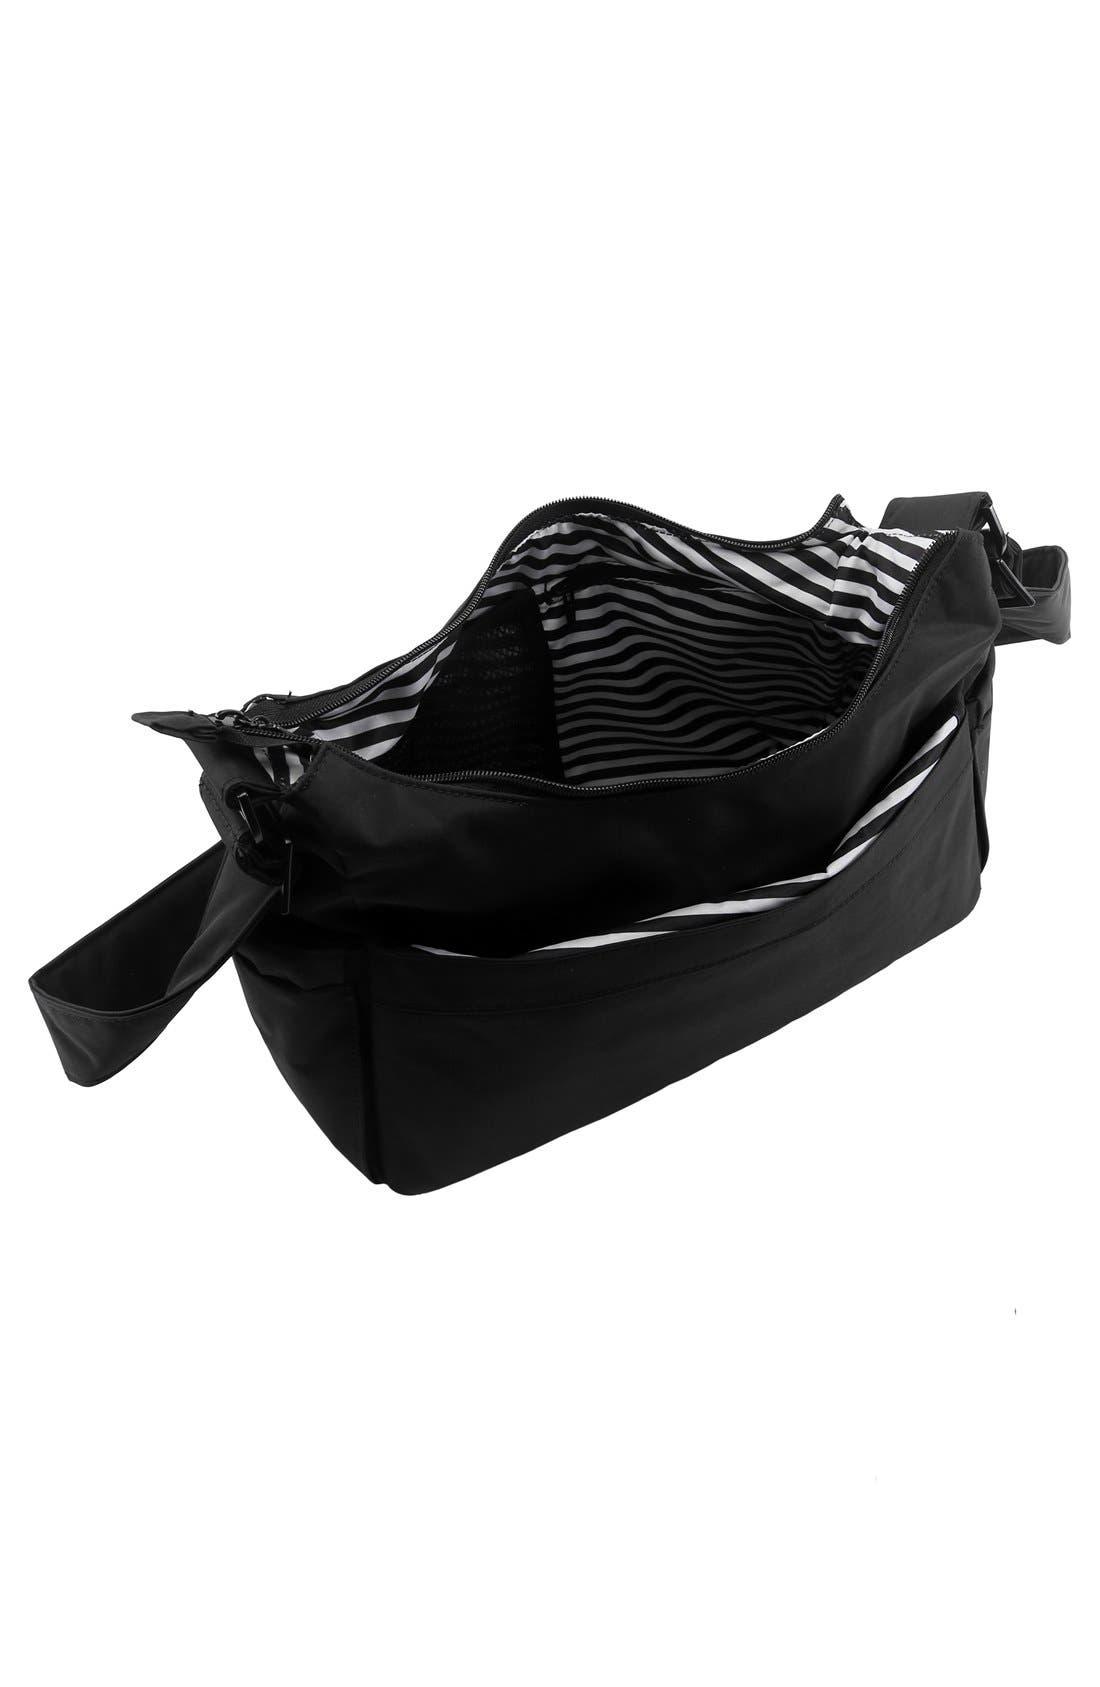 Alternate Image 2  - Ju-Ju-Be 'HoboBe' Diaper Bag